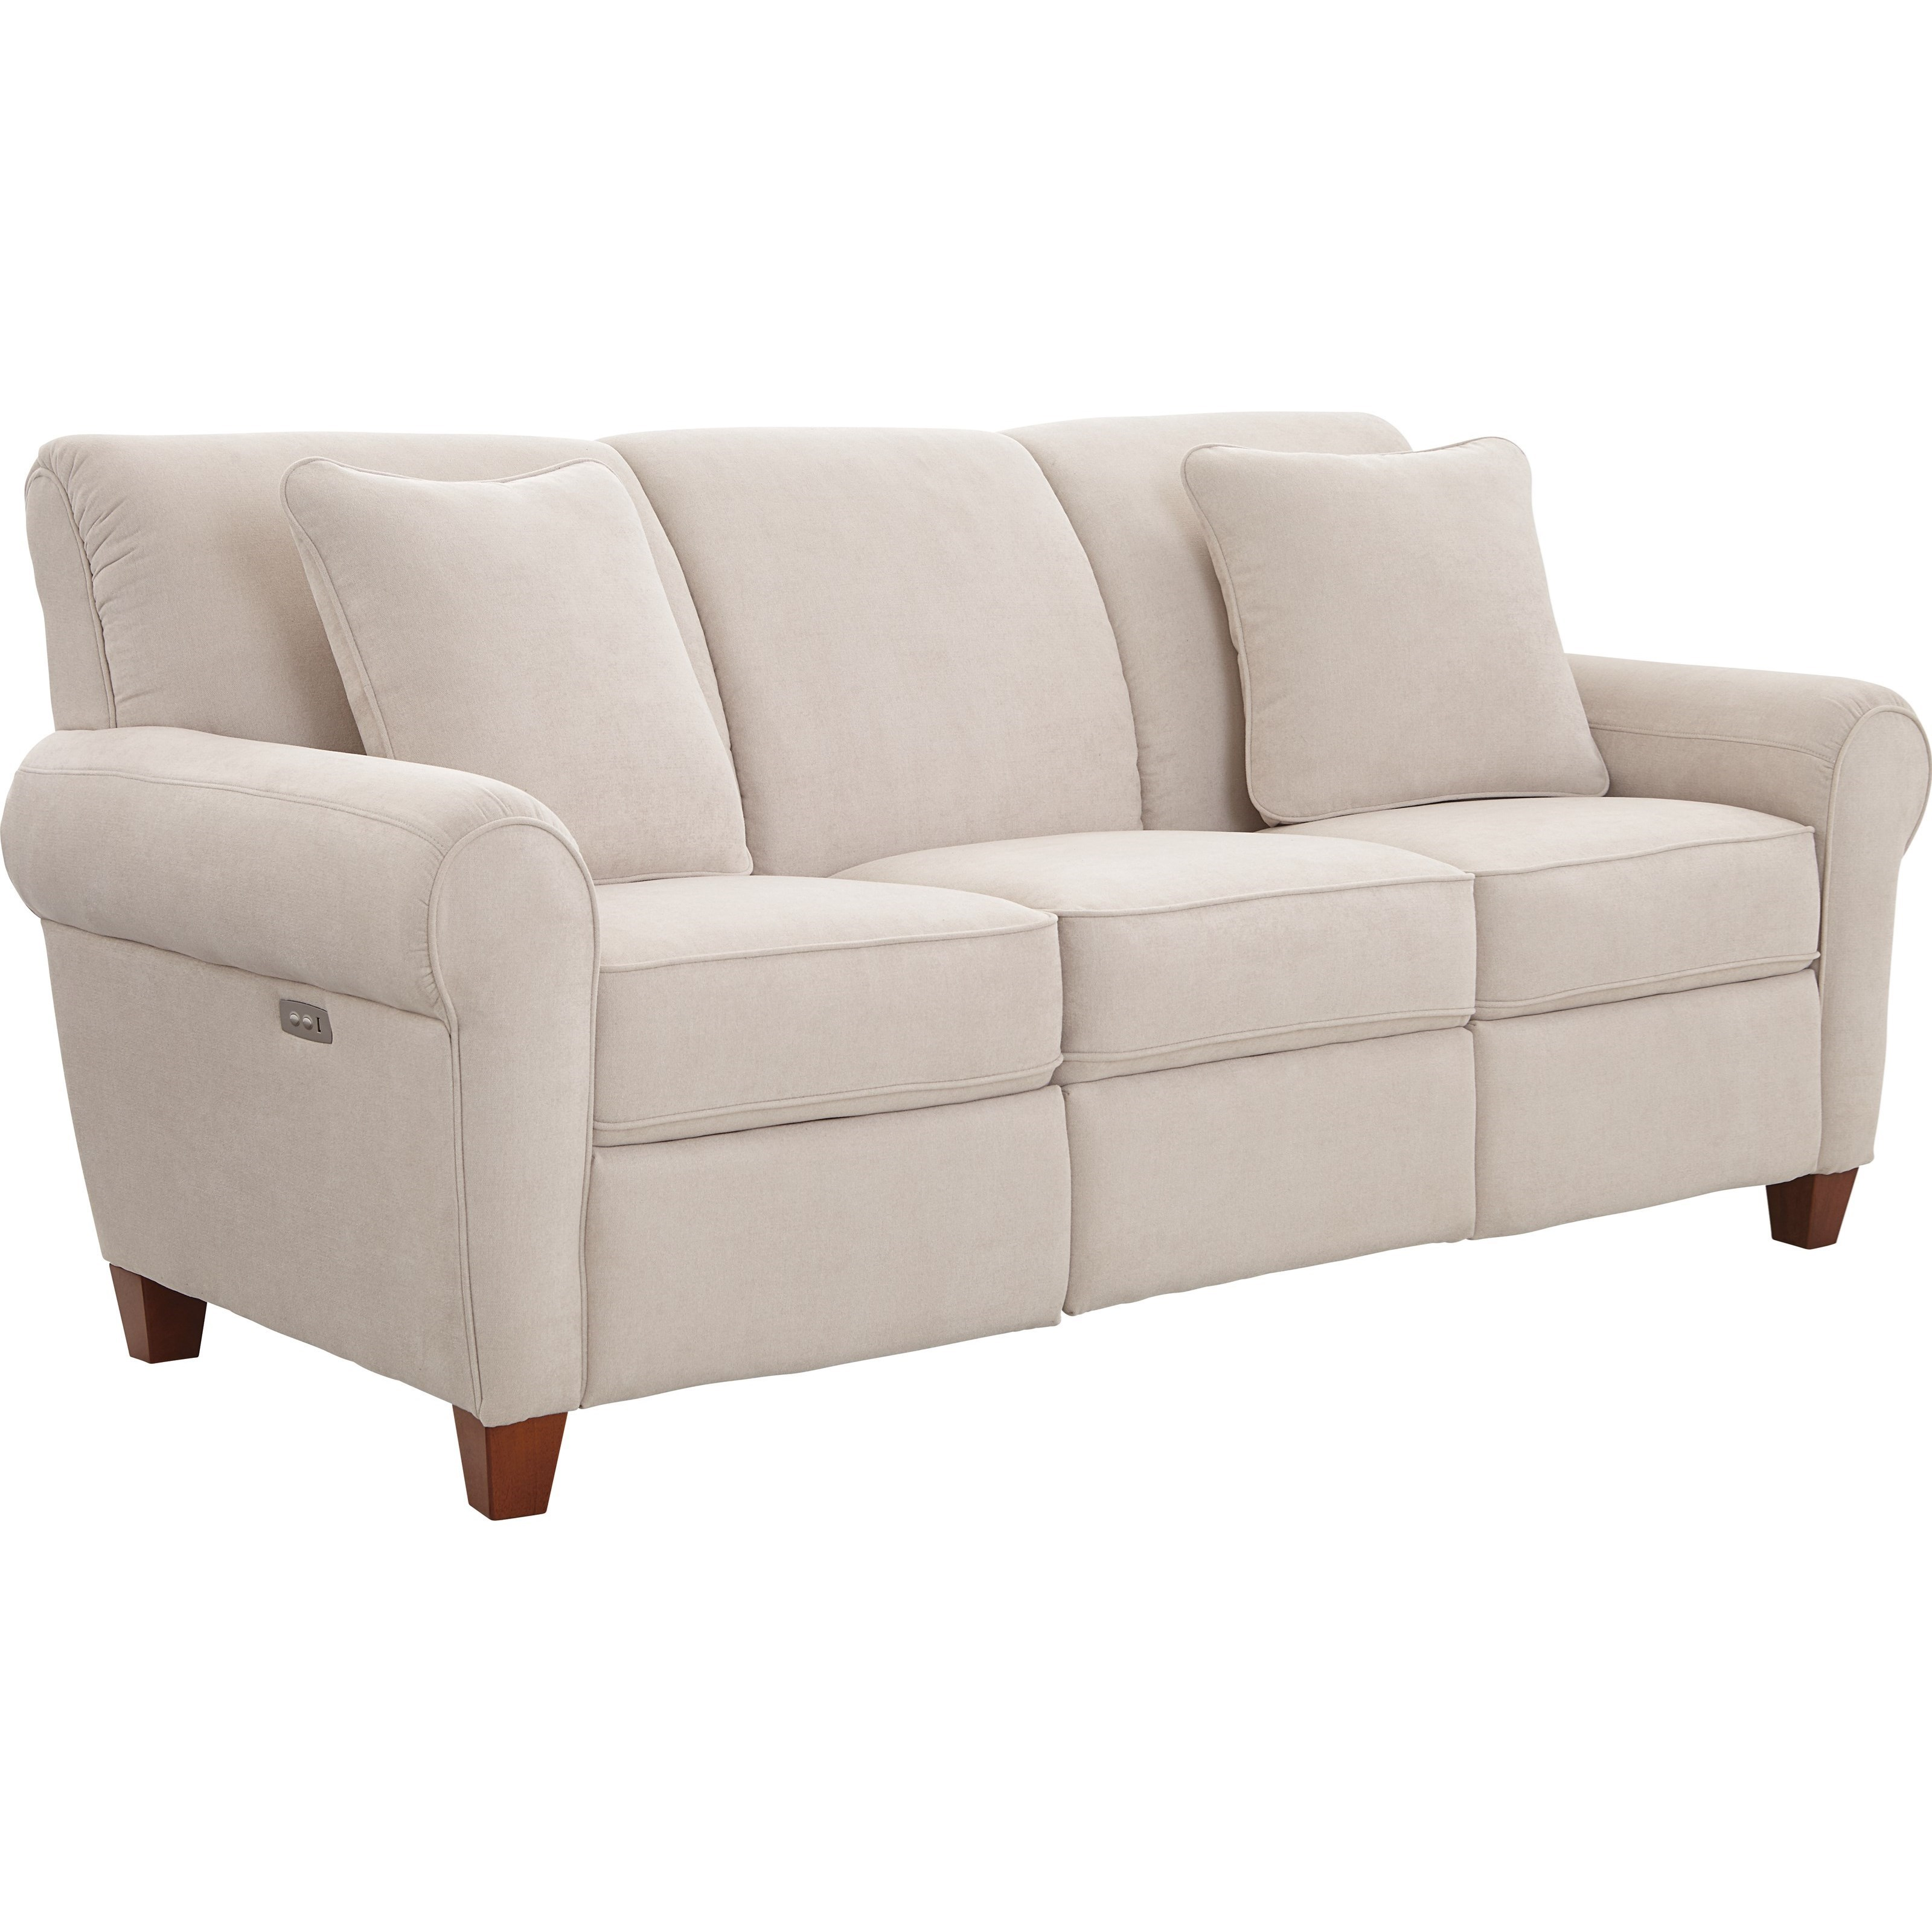 La Z Boy Bennett Duo™ Power Reclining Sofa With USB Charging Ports